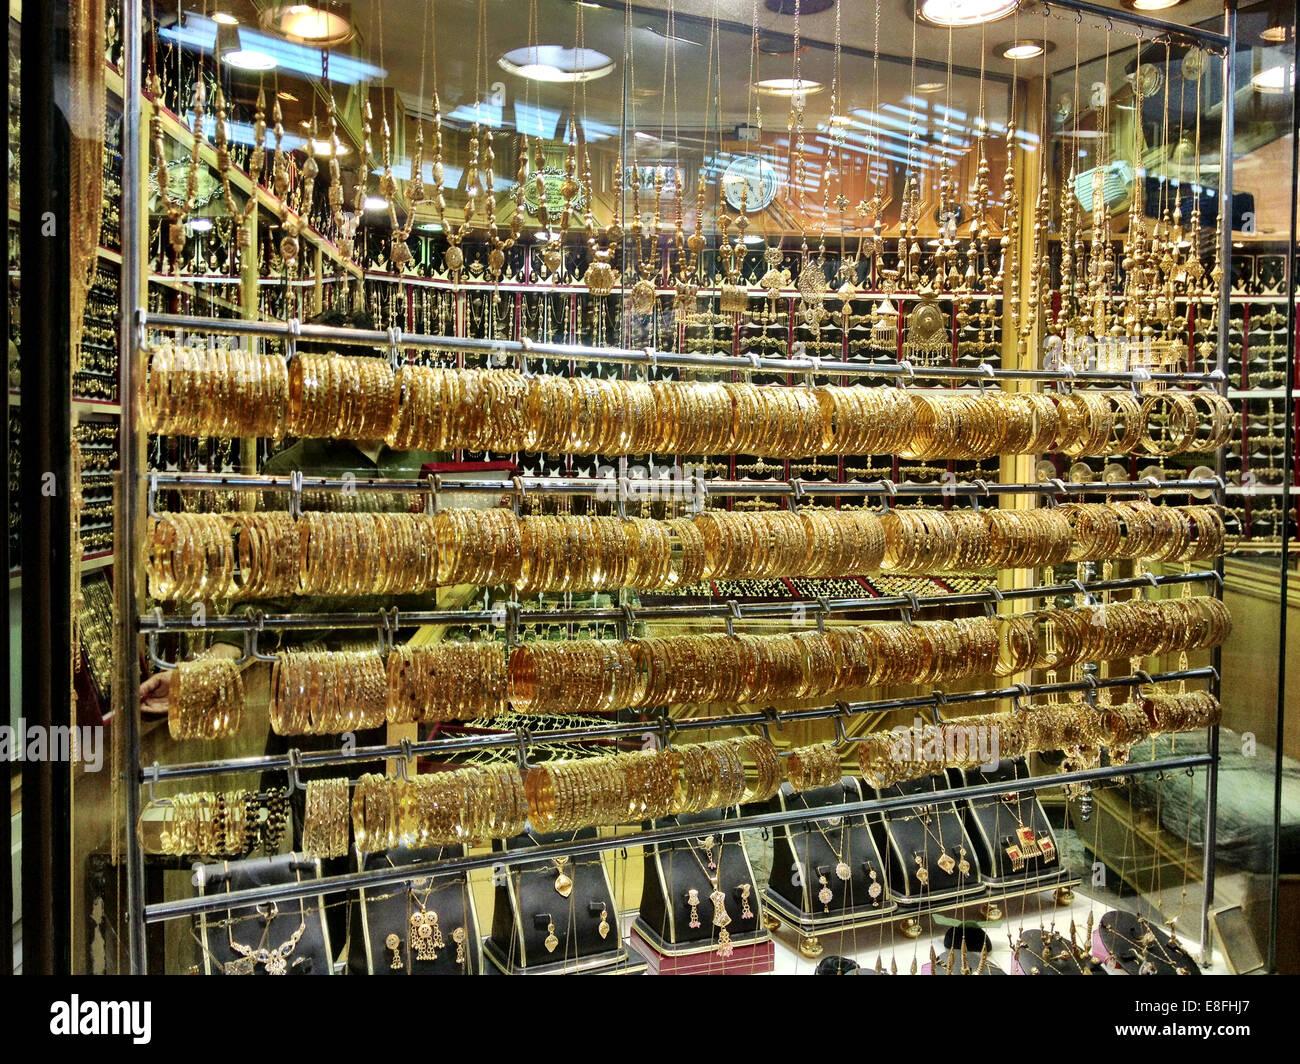 Oman, Muscat, Jewelry store - Stock Image